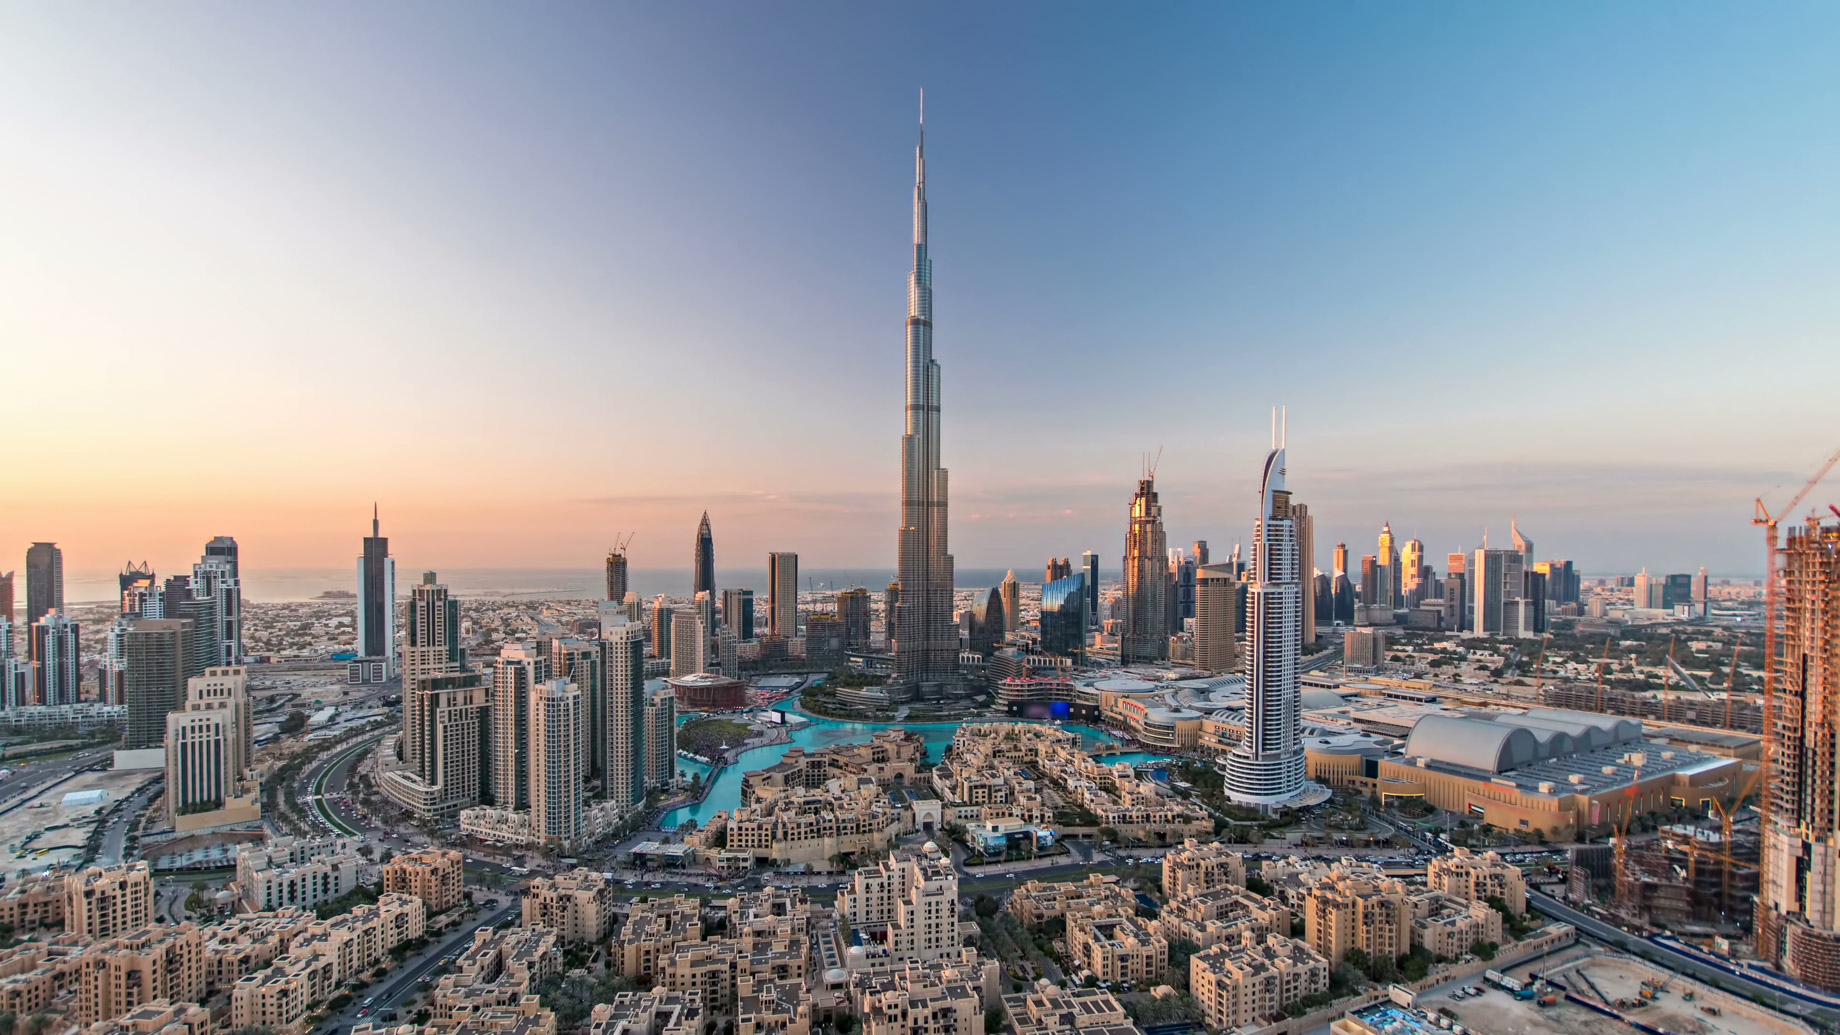 Downtown Dubai – Dubai, United Arab Emirates